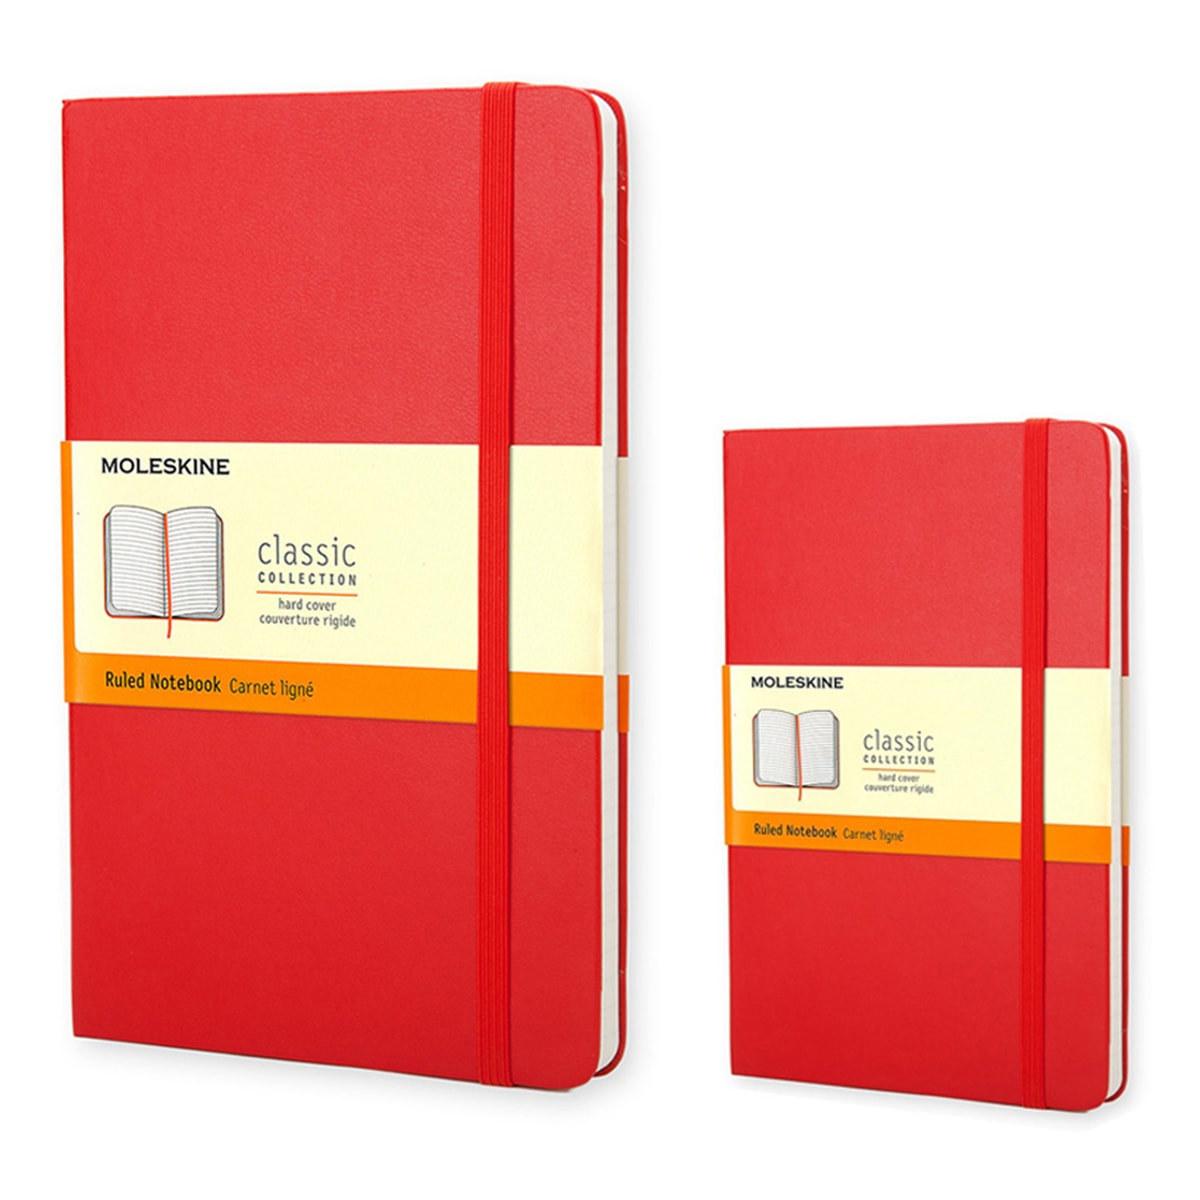 Moleskine 經典橫條筆記本(大型+口袋型) 紅2入